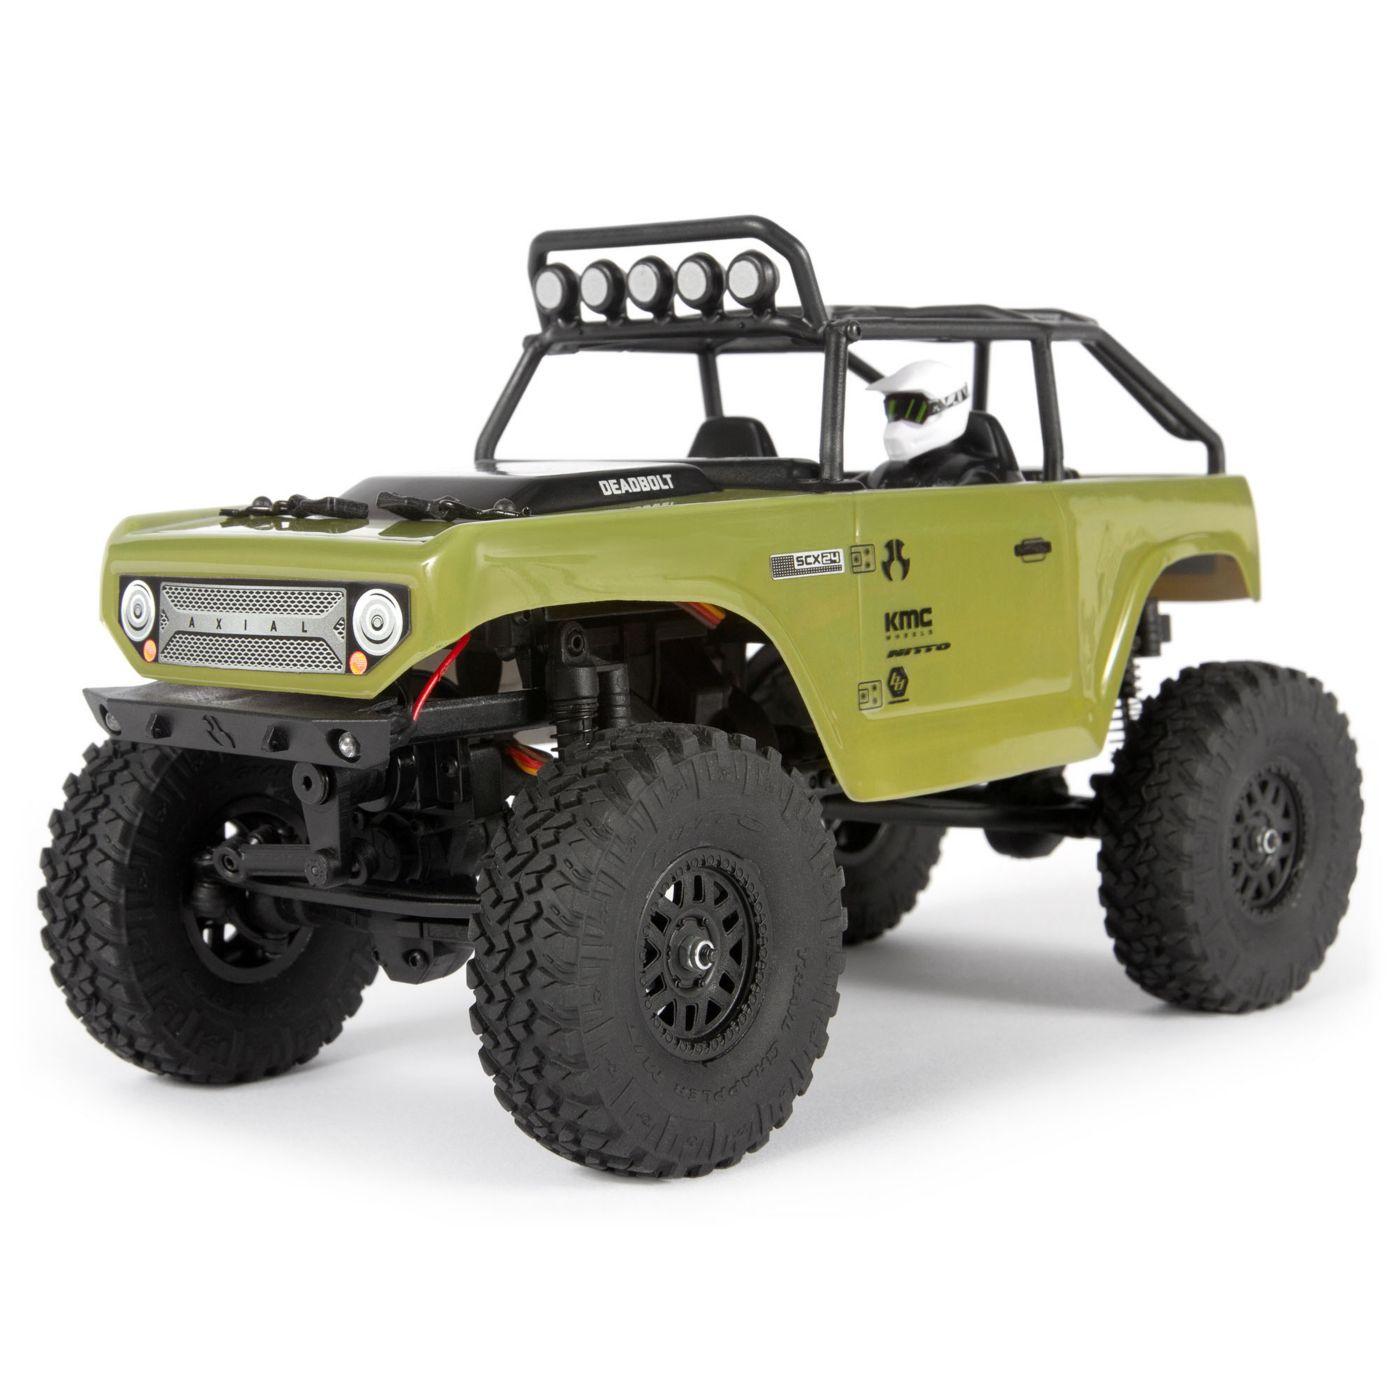 Модель для трофи Axial SCX24 Deadbolt 4WD 1:24, электро, RTR